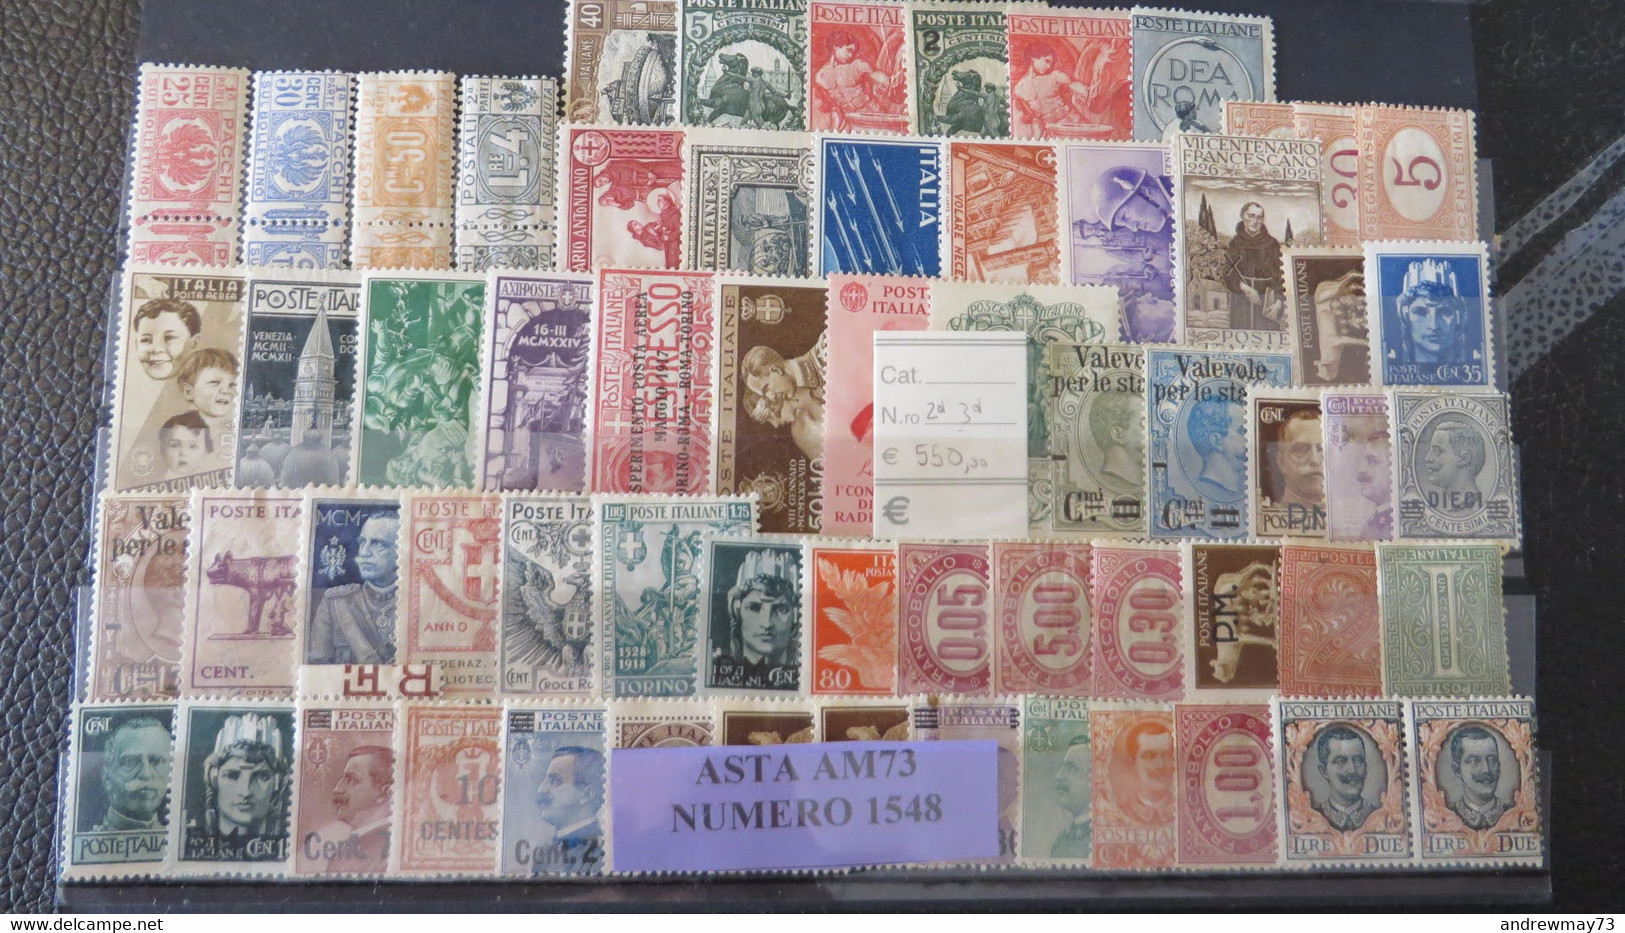 ITALY KINGDOM - NICE MNH SELECTION 2ND CHOICE 550 € ON SASSONE CATALOGUE - Mint/hinged